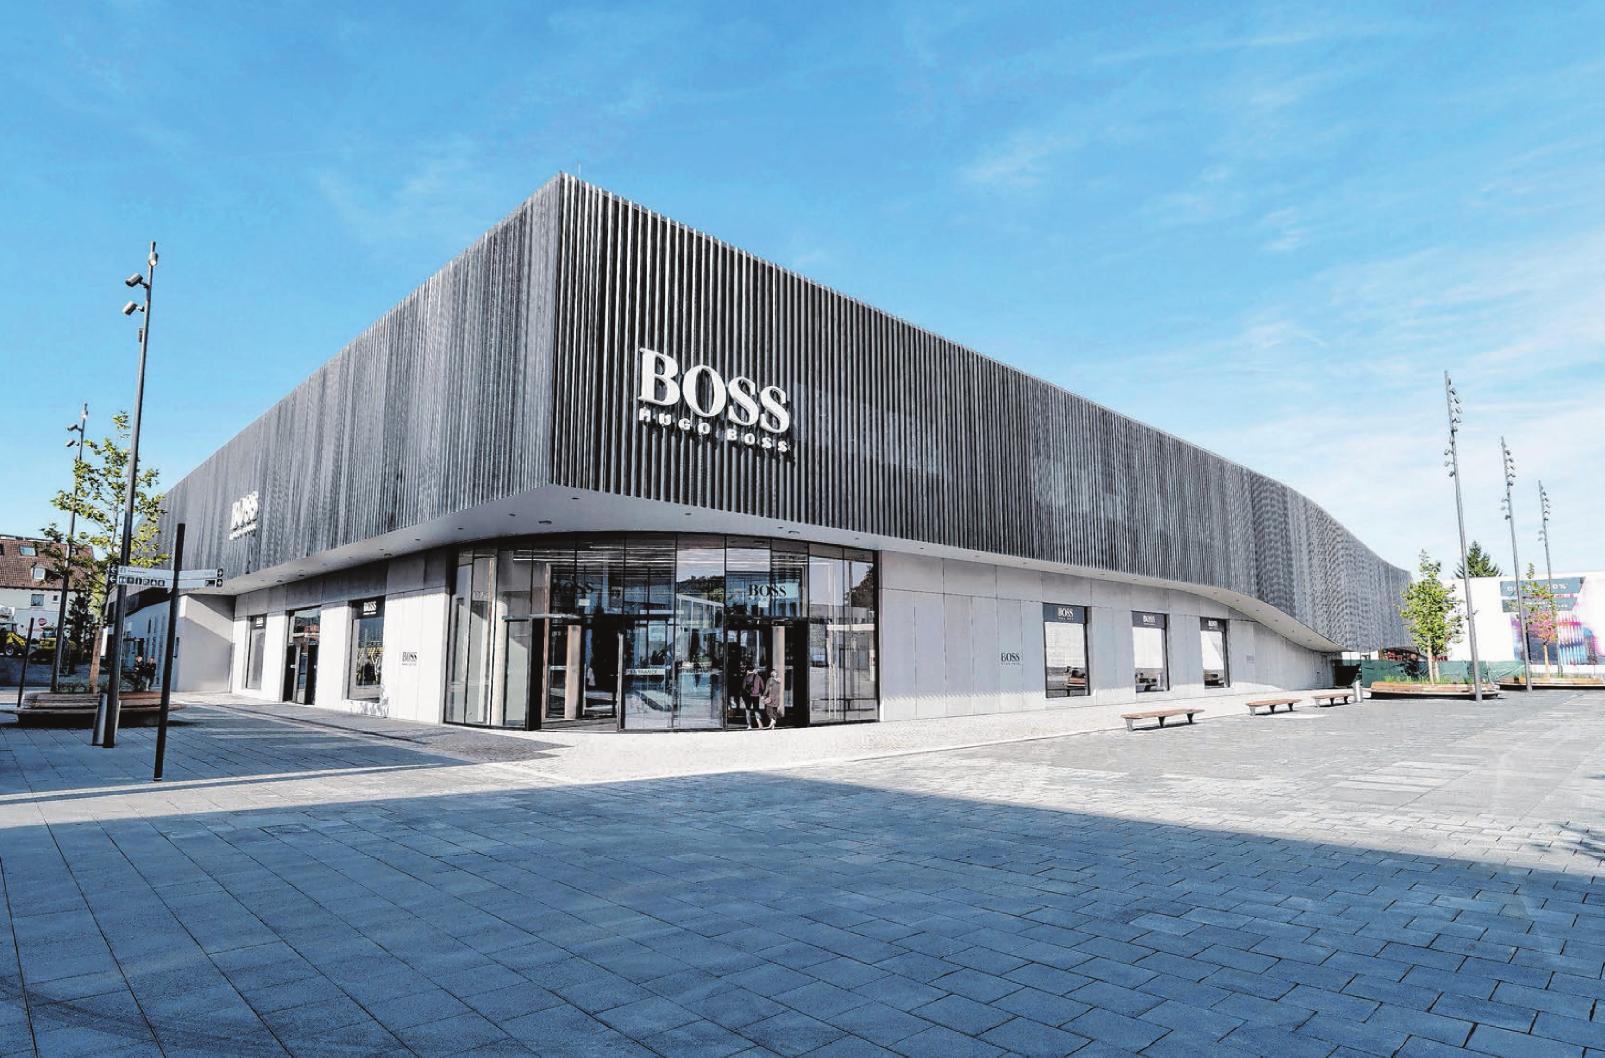 stor rabatt på grossist många fashionabla Eröffnung: Einkaufszentrum Boss-Outlet in Outletcity Metzingen